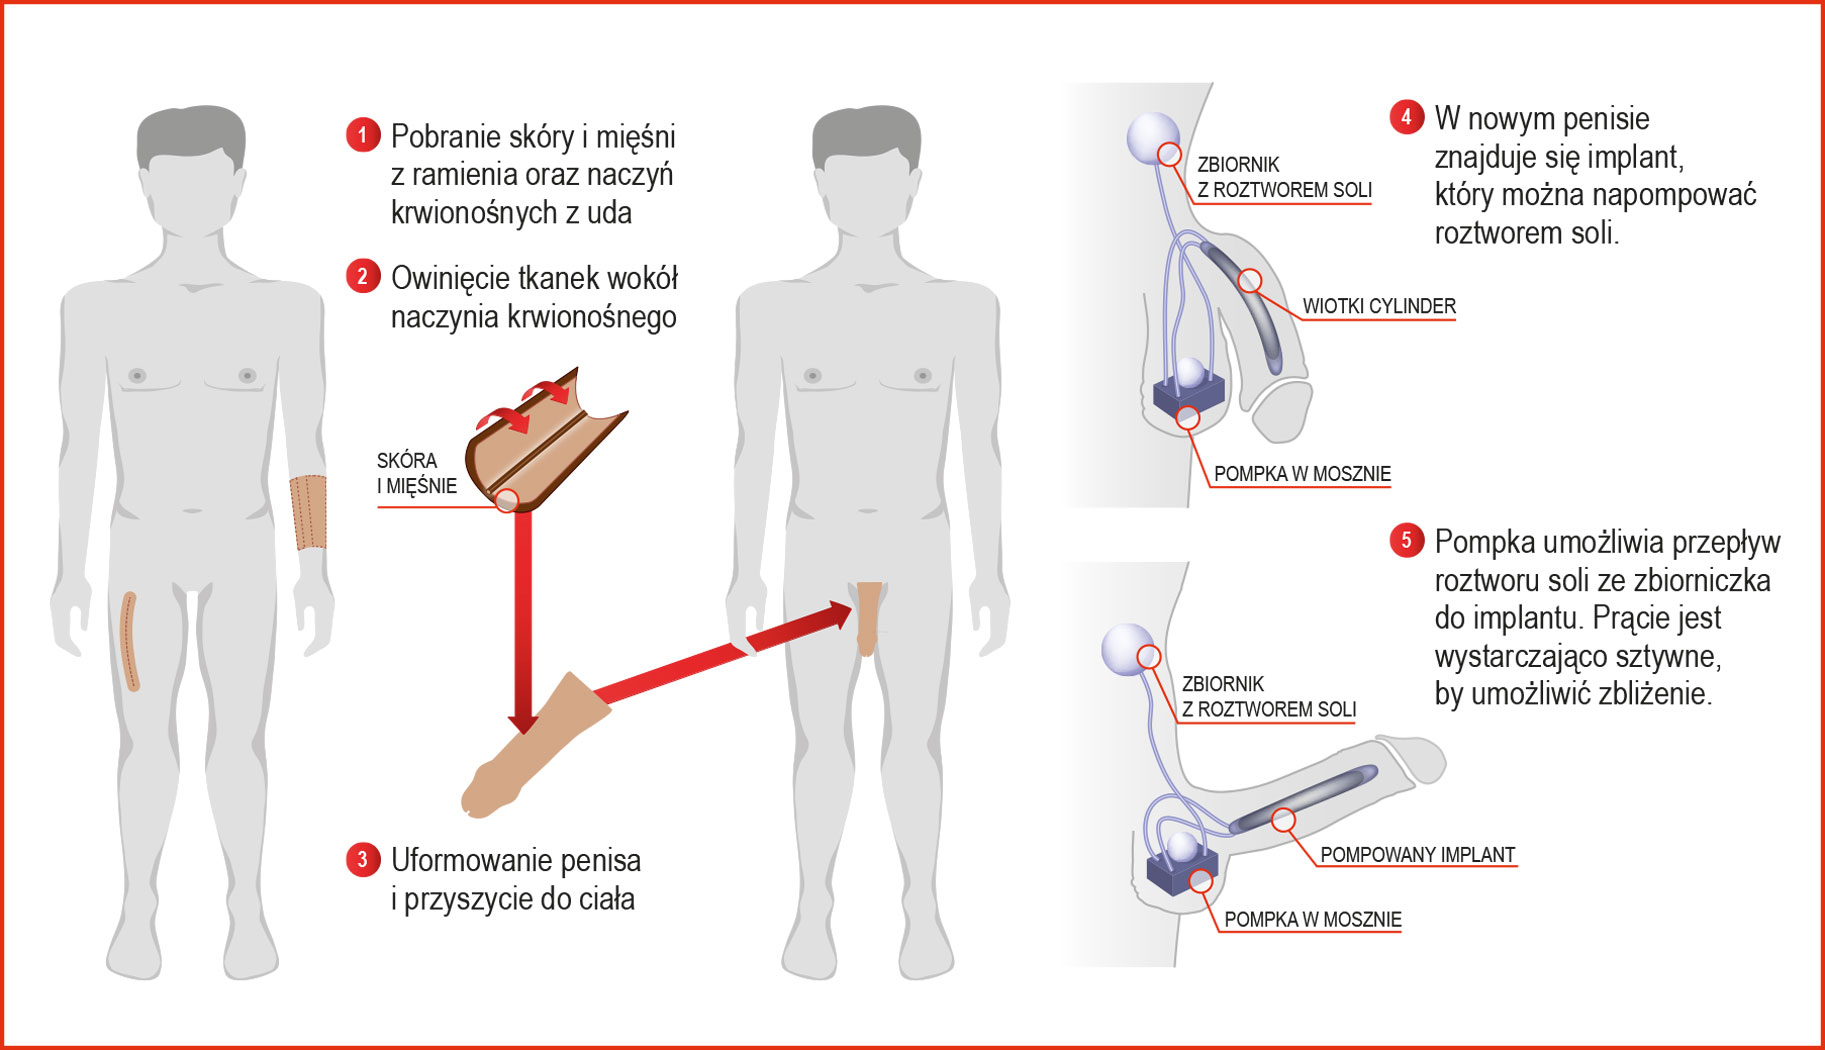 implant w penisie)